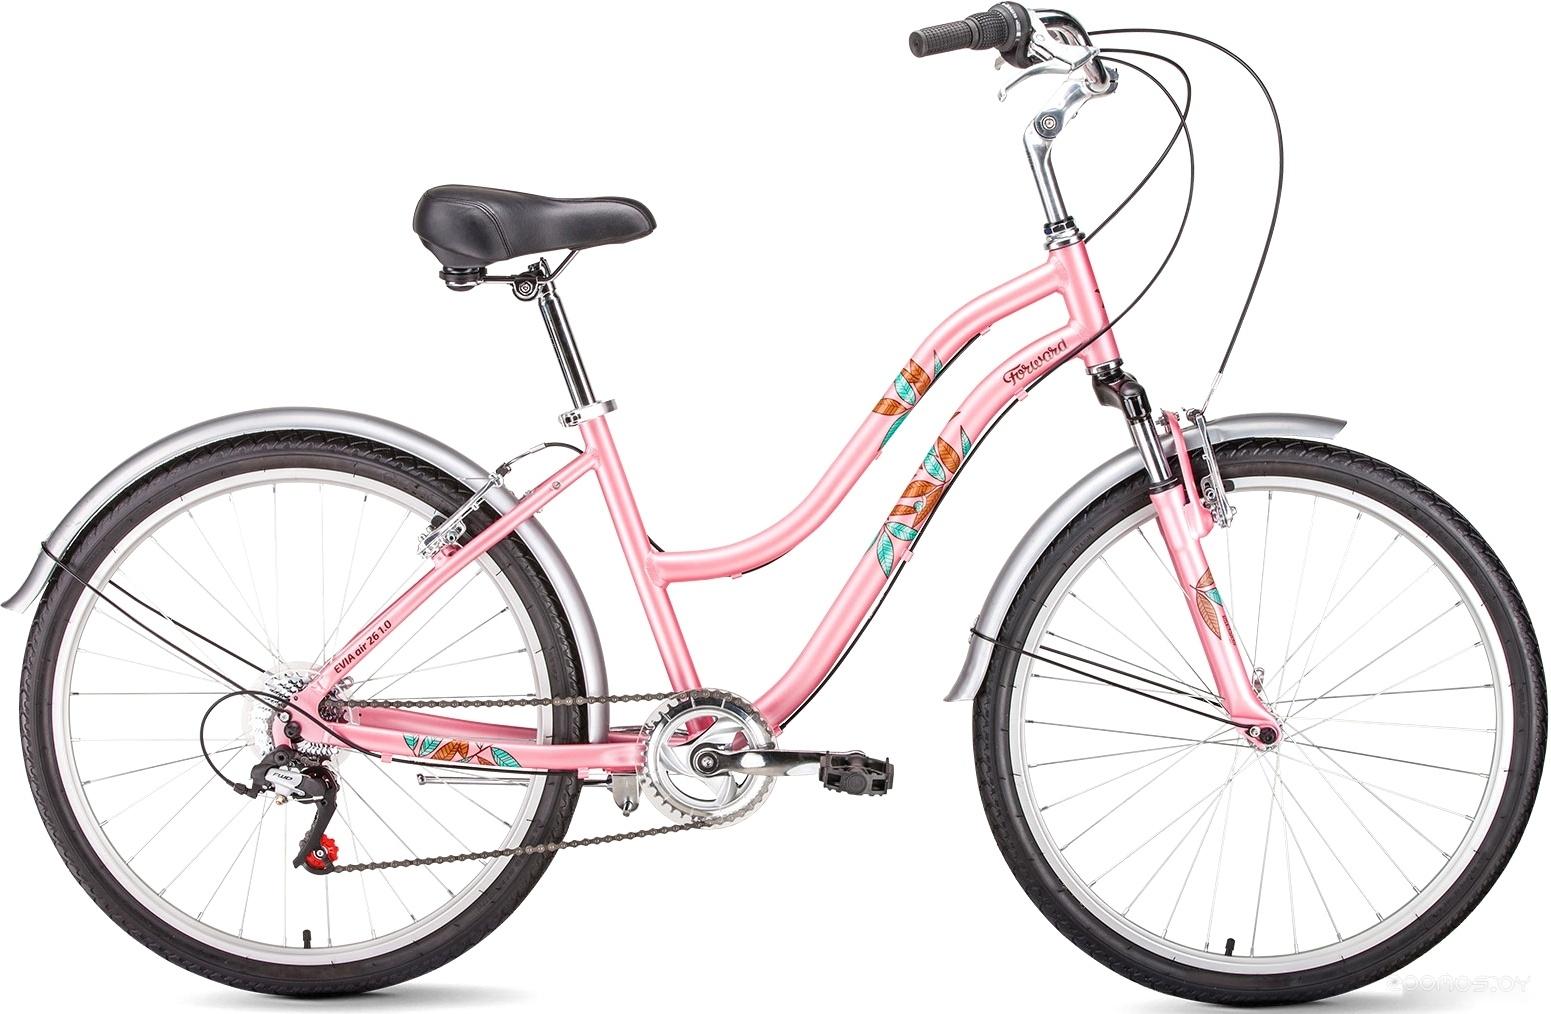 Велосипед Forward Evia Air 26 1.0 (розовый, 2019)